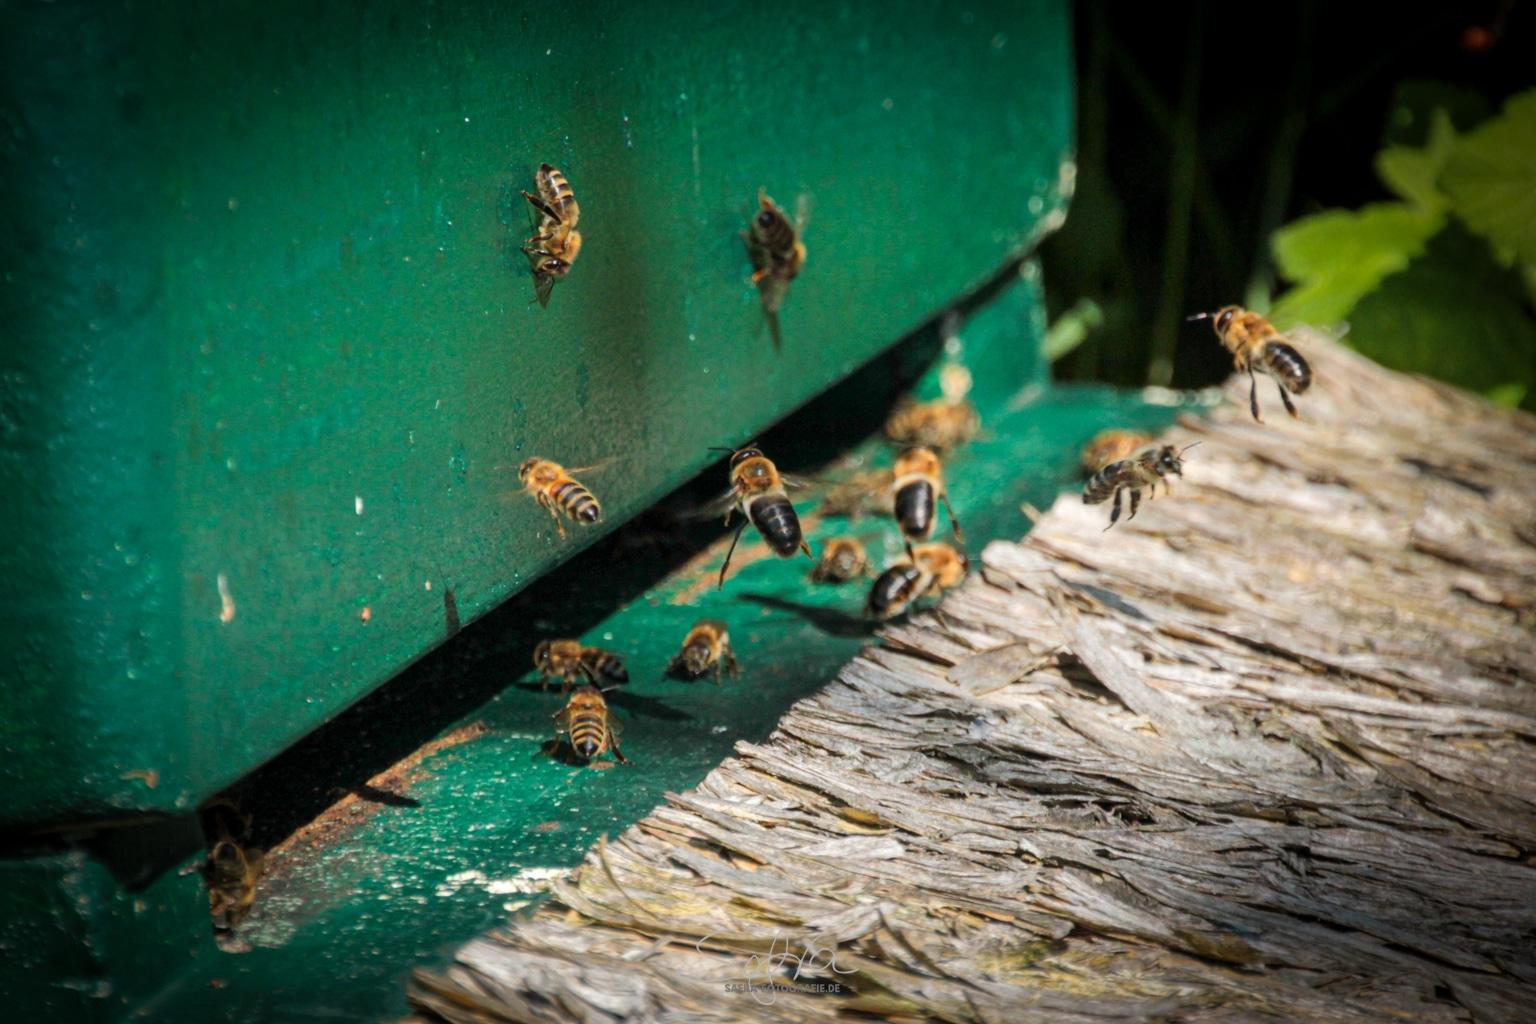 Falken Gesäß, Bienenvolk